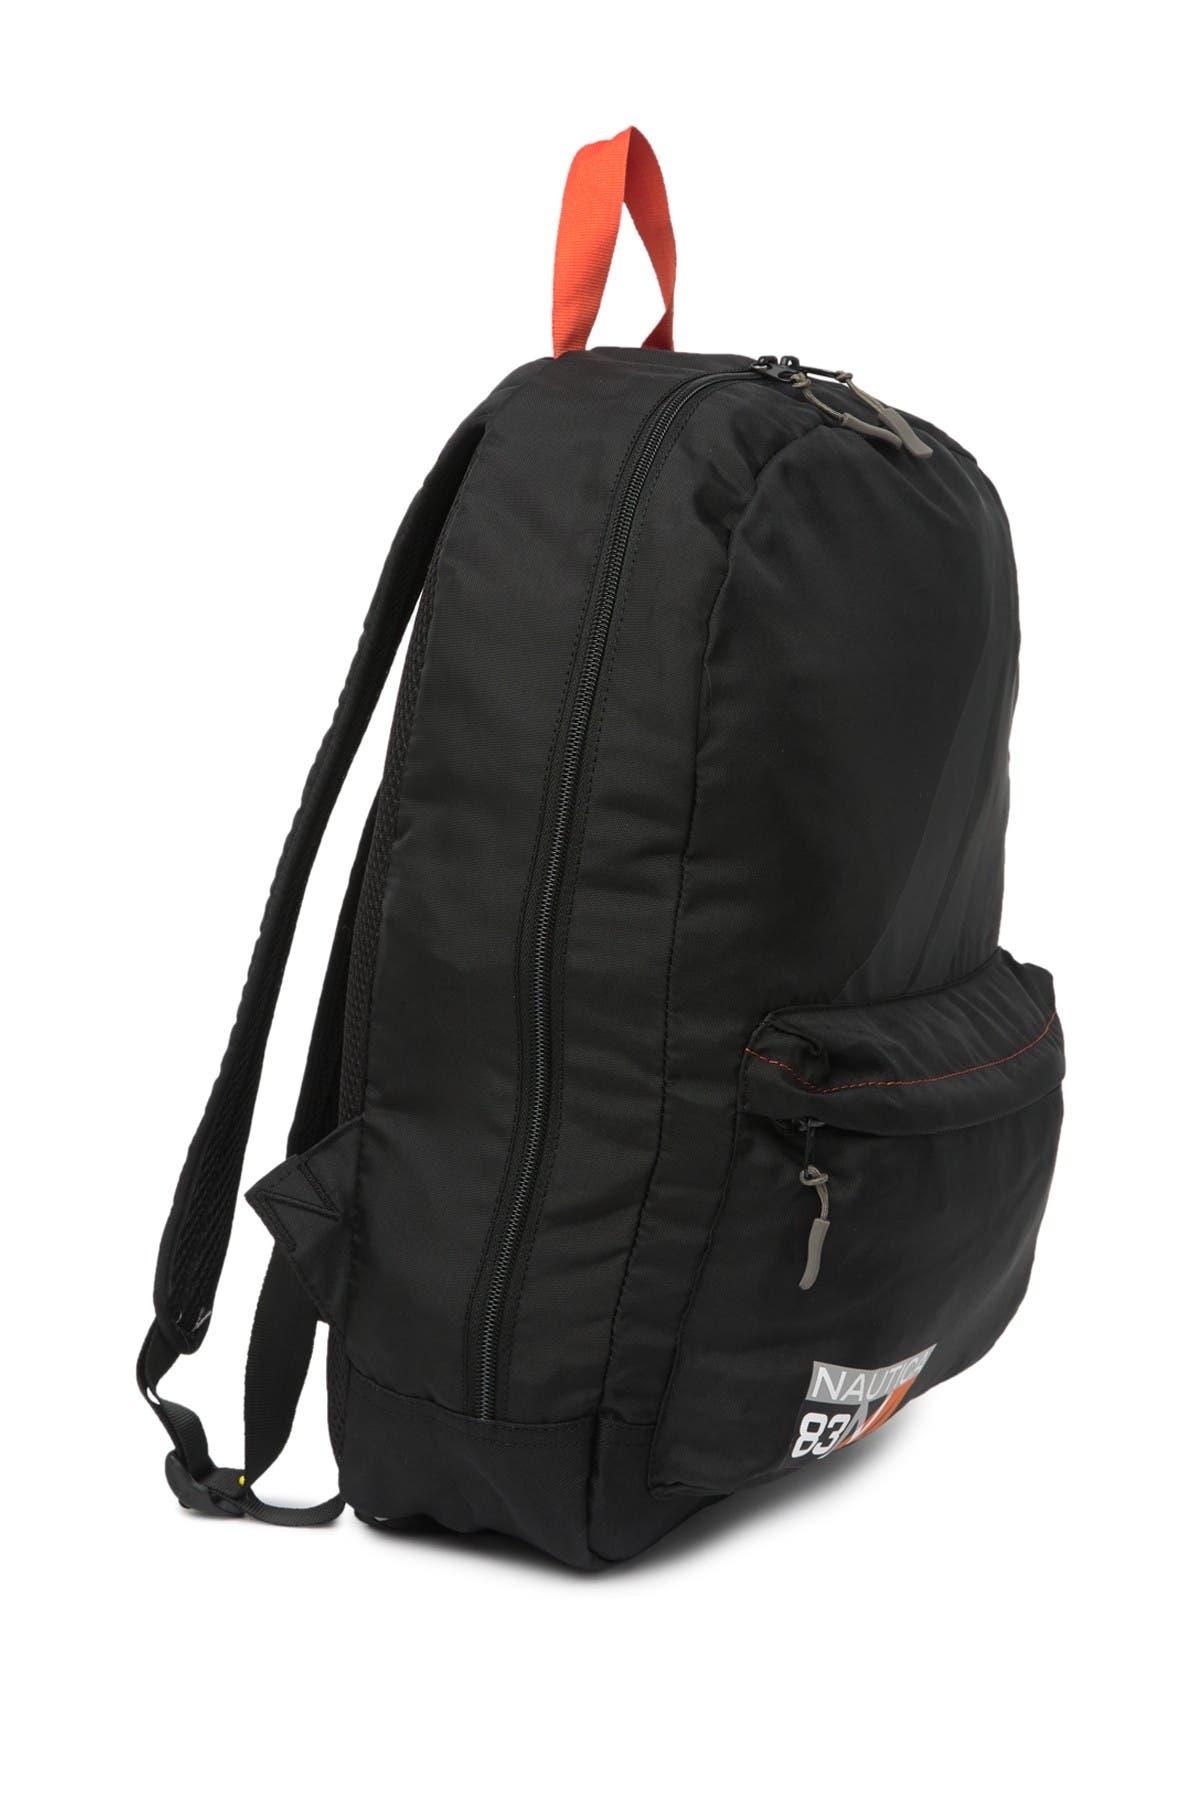 Image of Nautica Shadow J Backpack